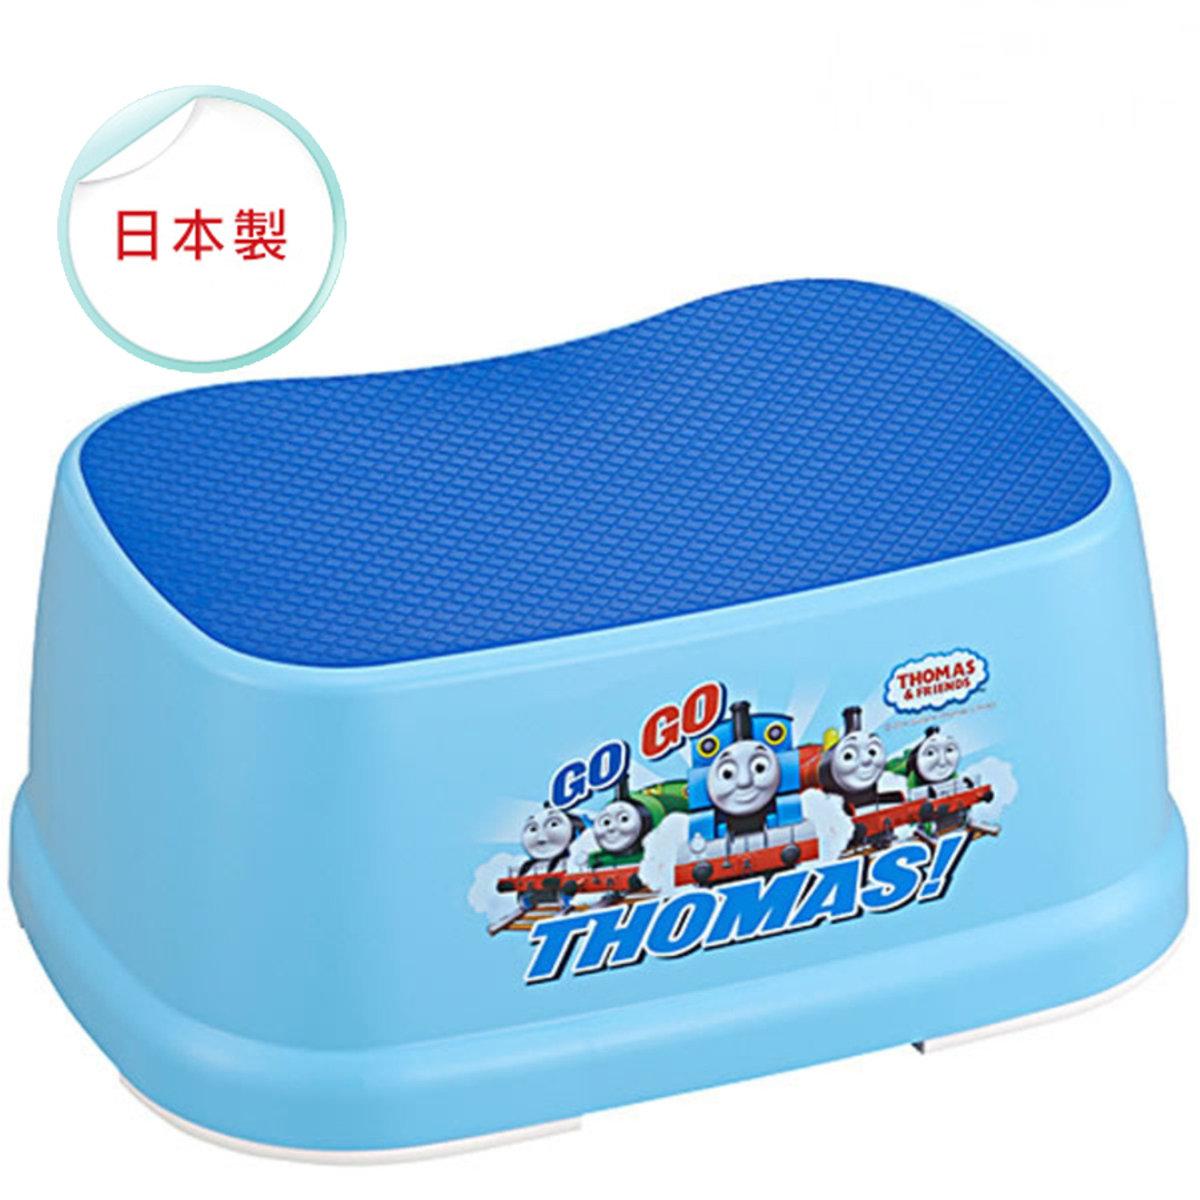 Thomas浴室腳踏凳(102875)